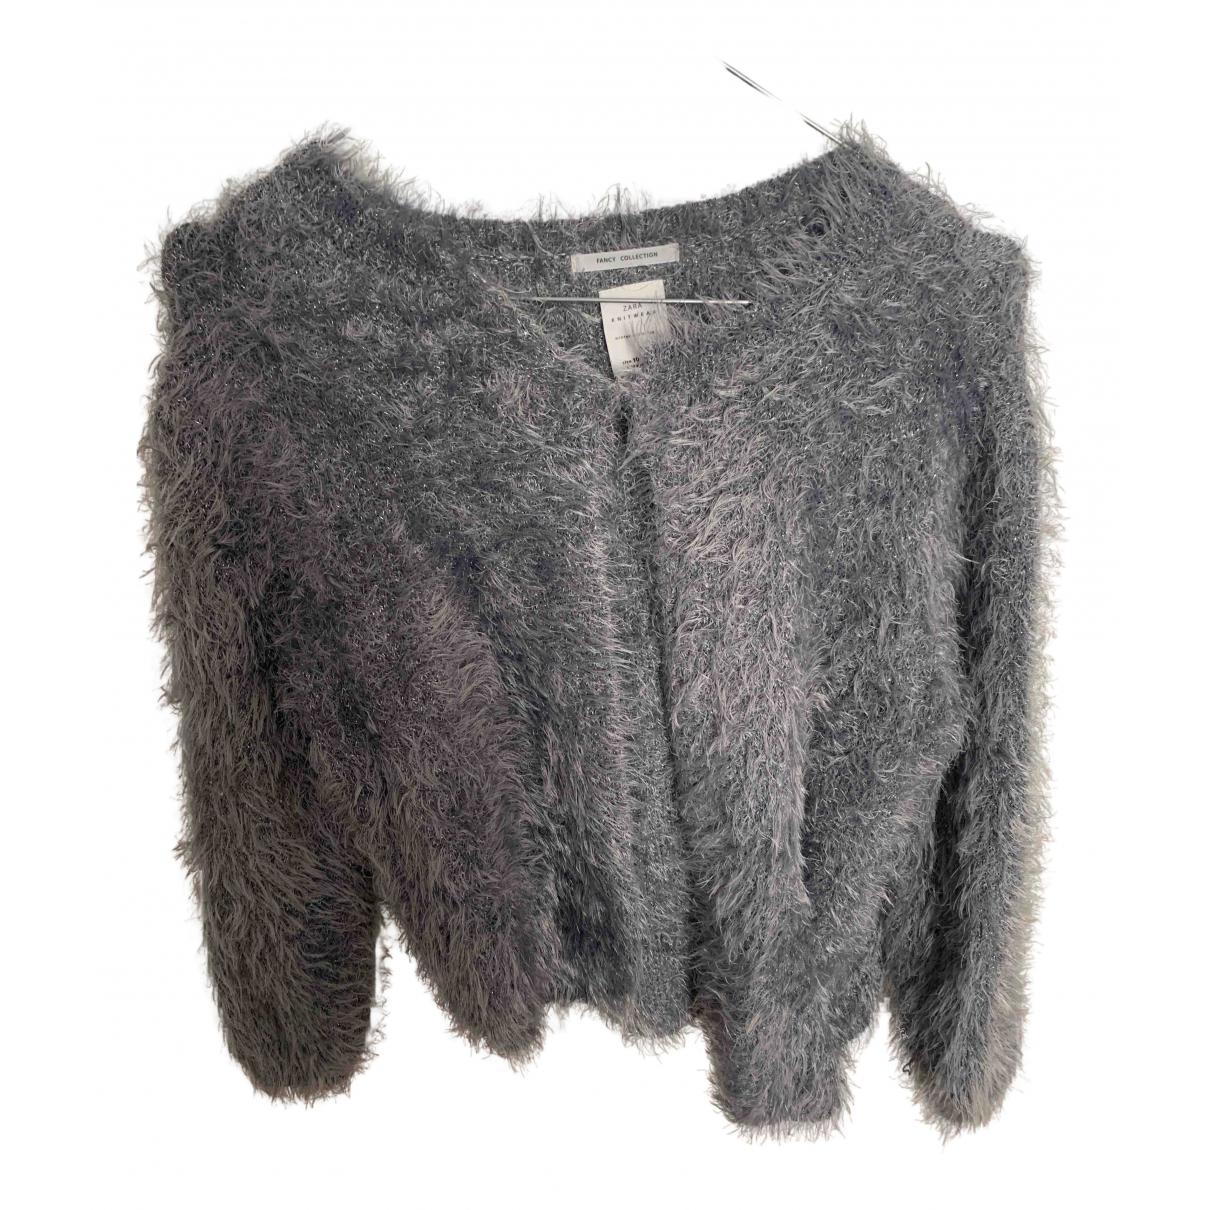 Zara N Grey Knitwear for Kids 10 years - up to 142cm FR